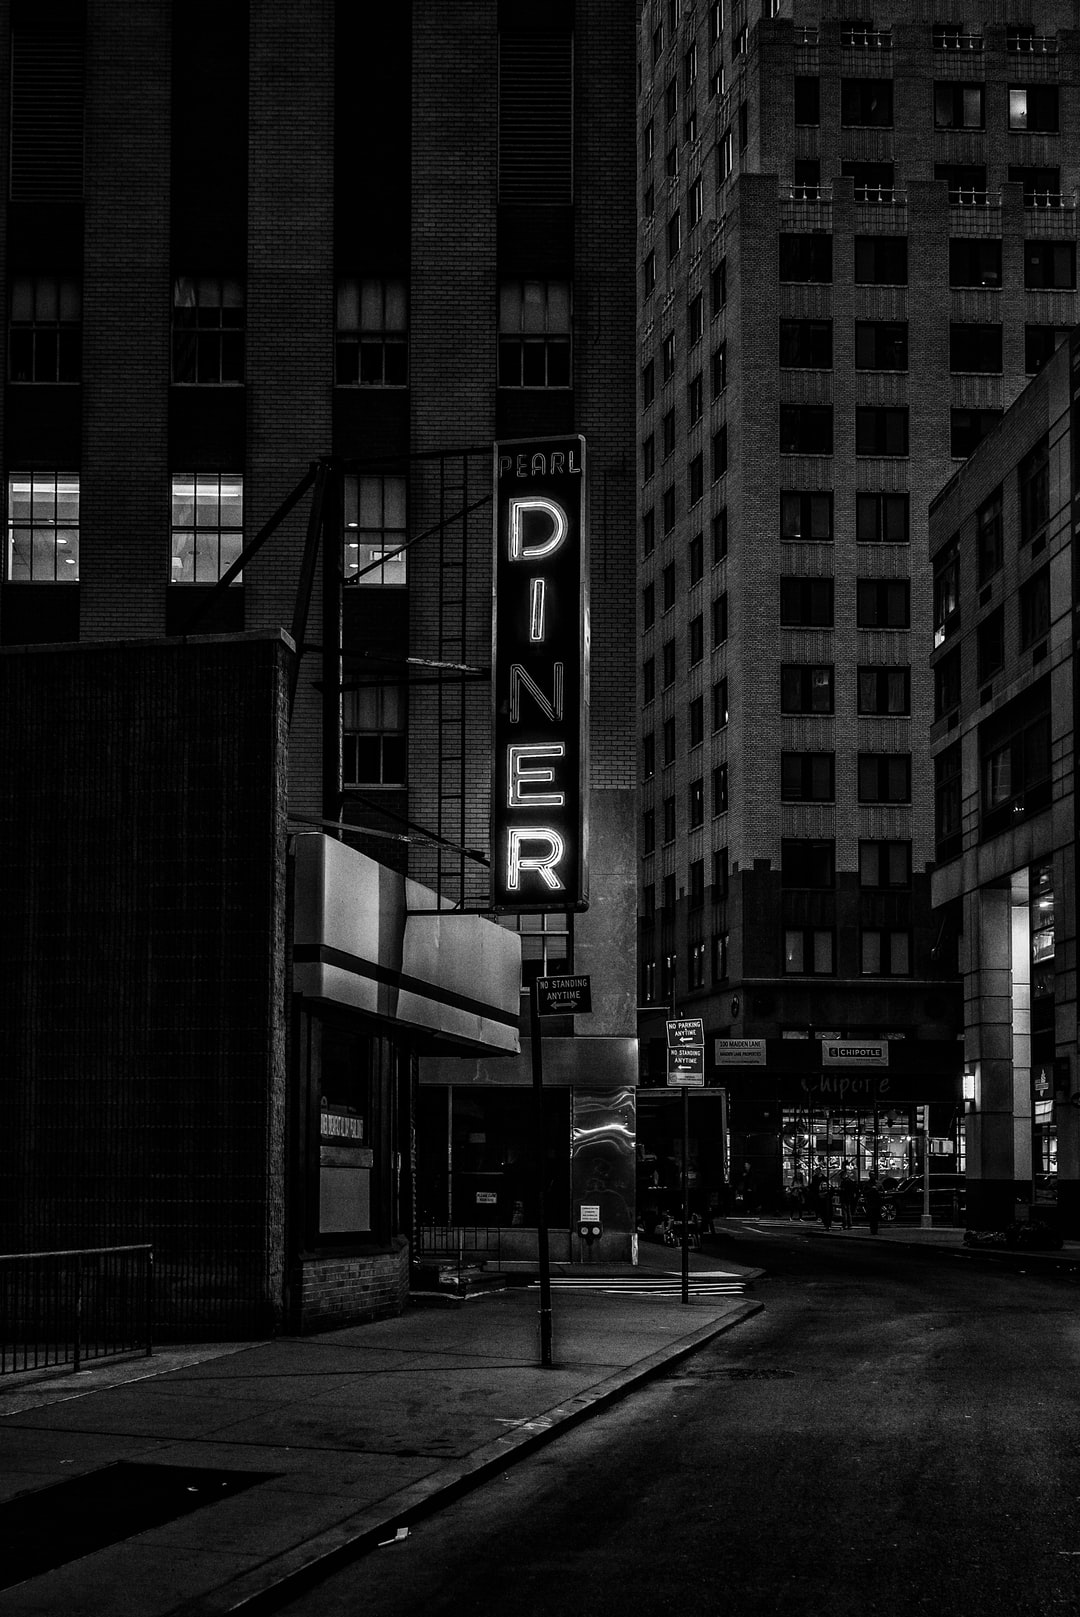 diner sign financial district